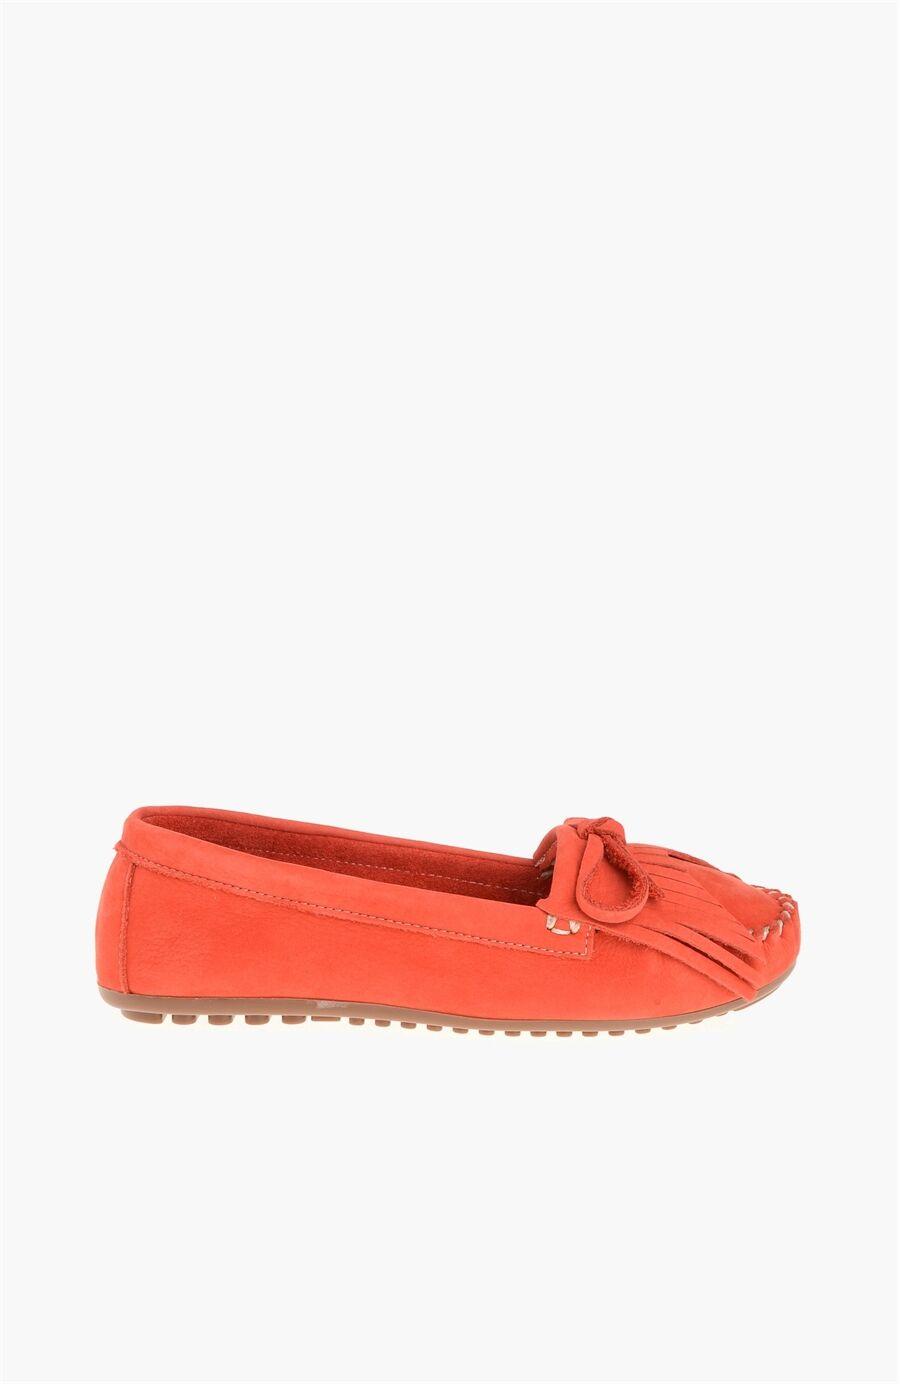 Dıvarese Kırmızı Loafer – 399.0 TL